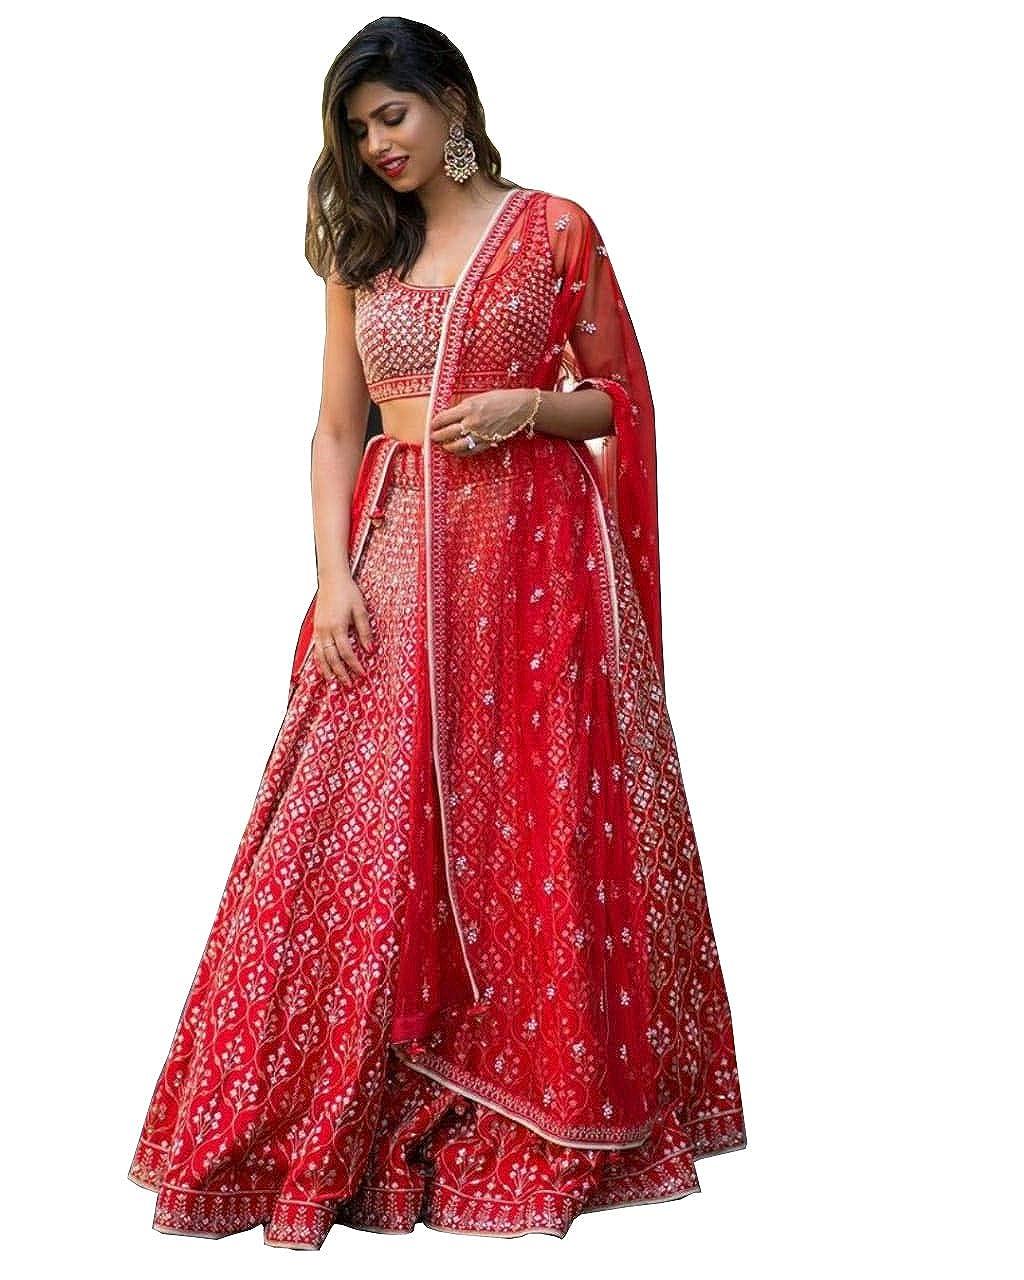 Heavy bridal wedding lehenga choli dream exporter 1119